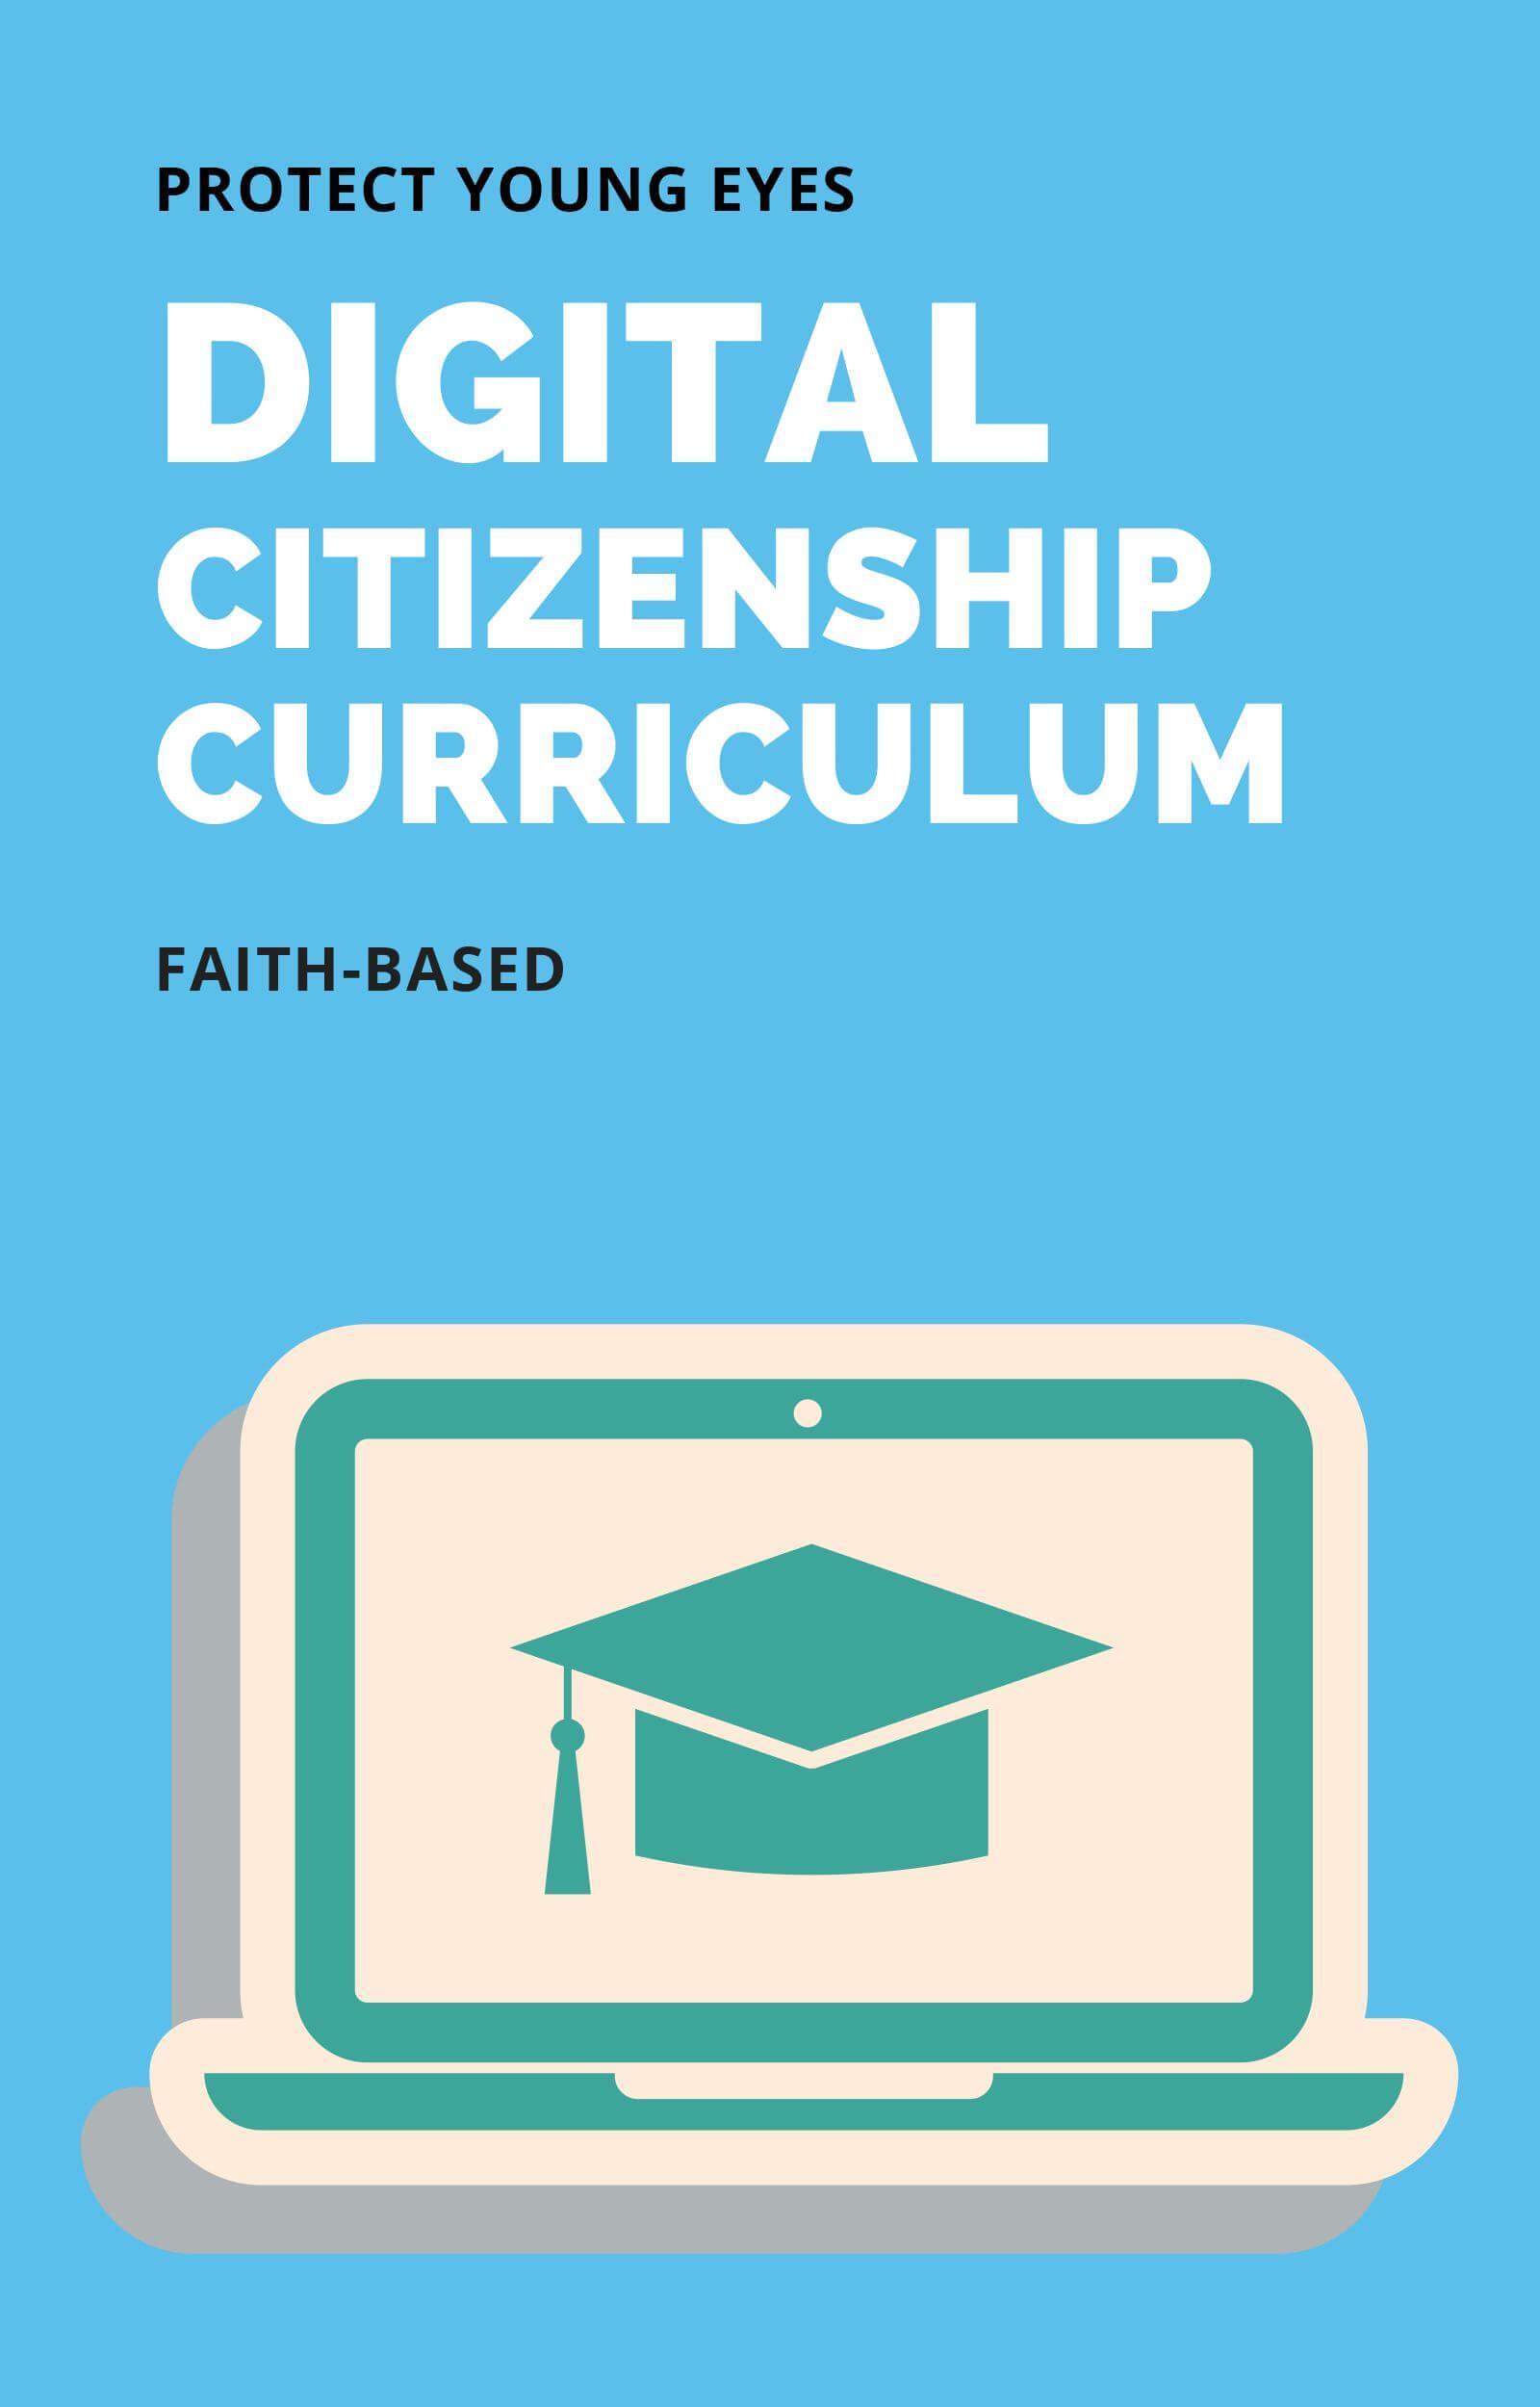 Digital Citizenship Curriculum - PYE